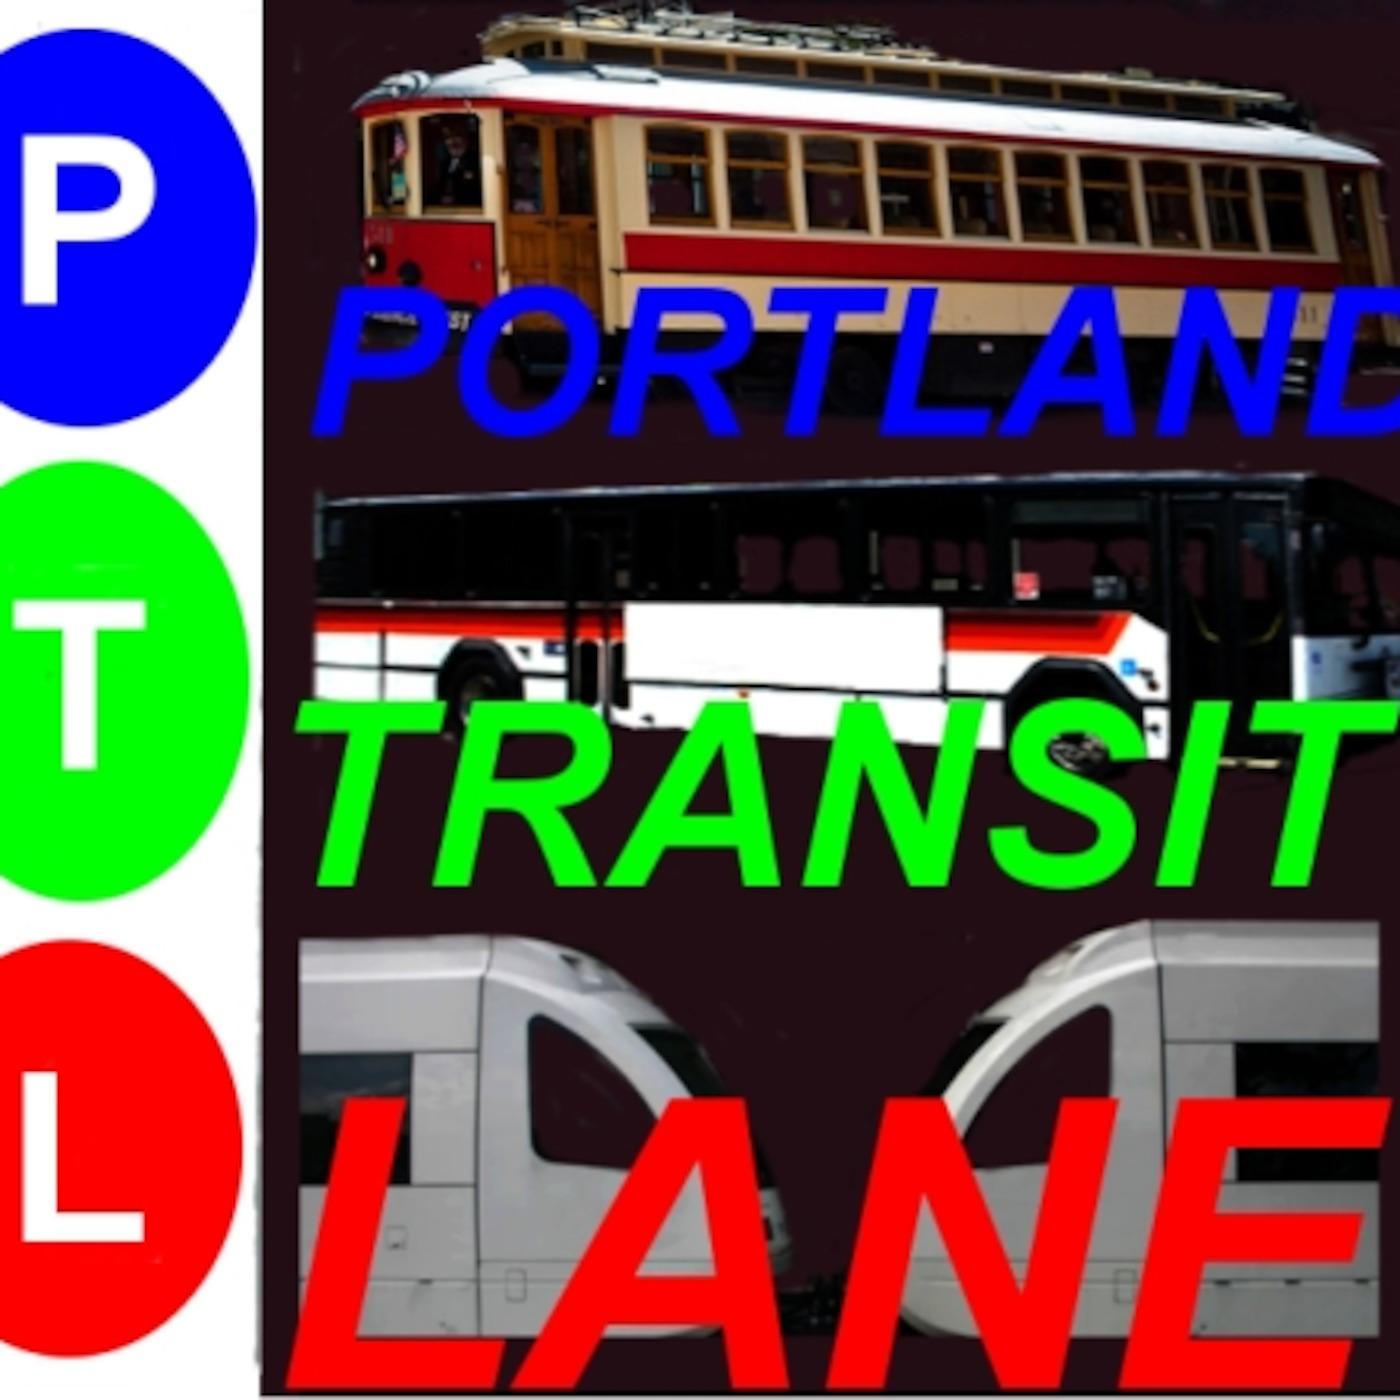 Portland Transit Lane